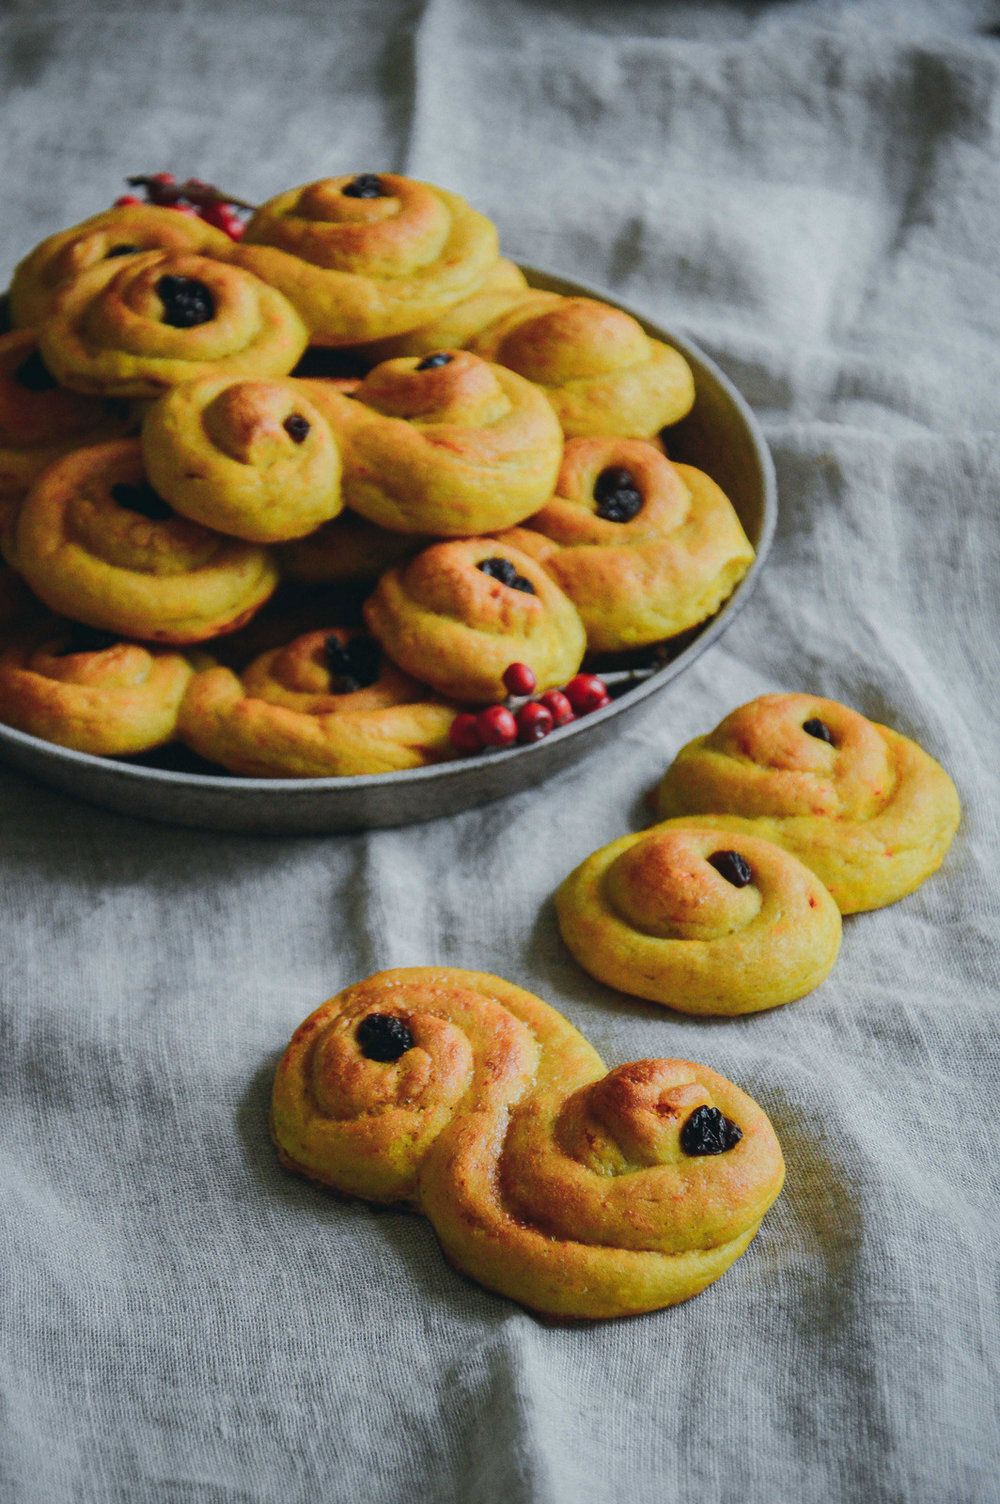 Glutenfree saffron buns | glutenfria lussekatter via The Nordic Kitchen